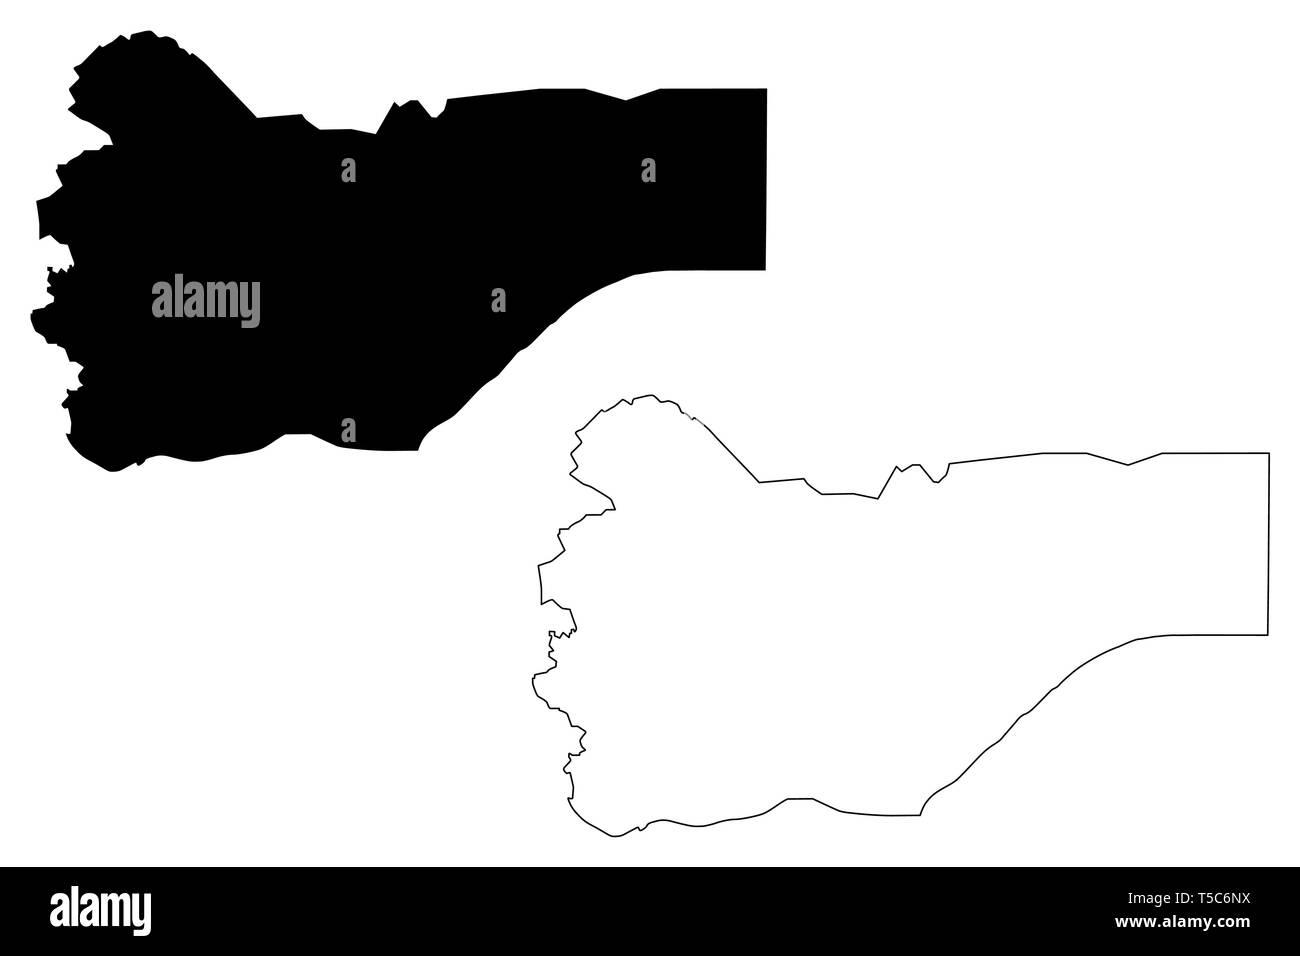 Saada Governorate (Governorates of Yemen, Republic of Yemen) map vector illustration, scribble sketch Sa'dah  or Sana map - Stock Vector